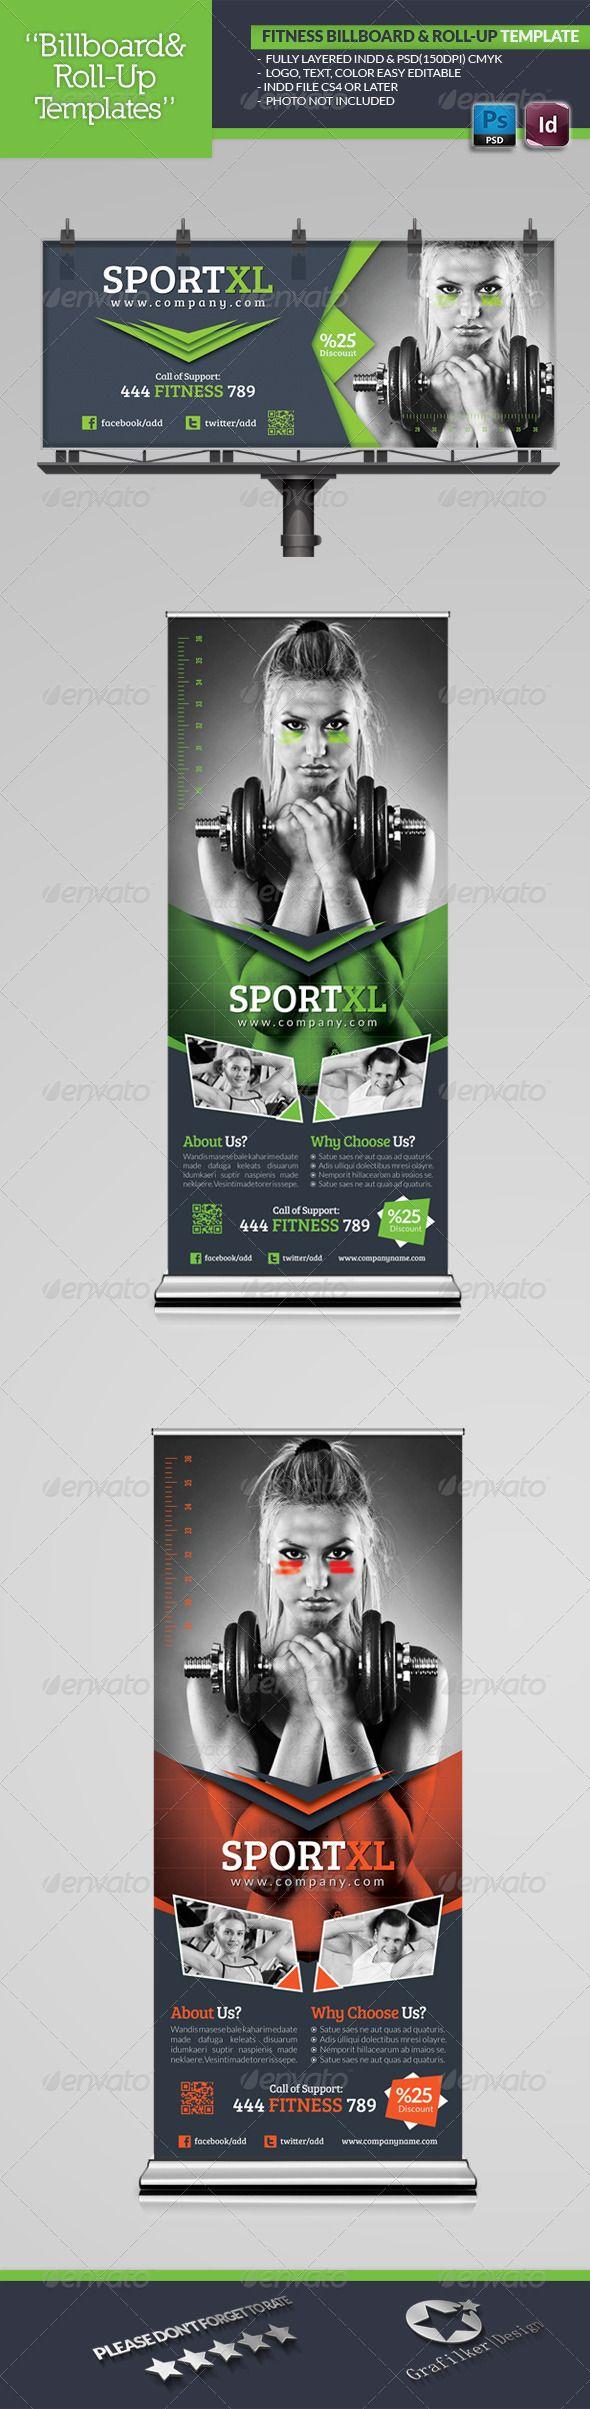 Fitness Billboard & Roll-Up Template #design Download: http://graphicriver.net/item/fitness-billboard-rollup-template/5014982?ref=ksioks